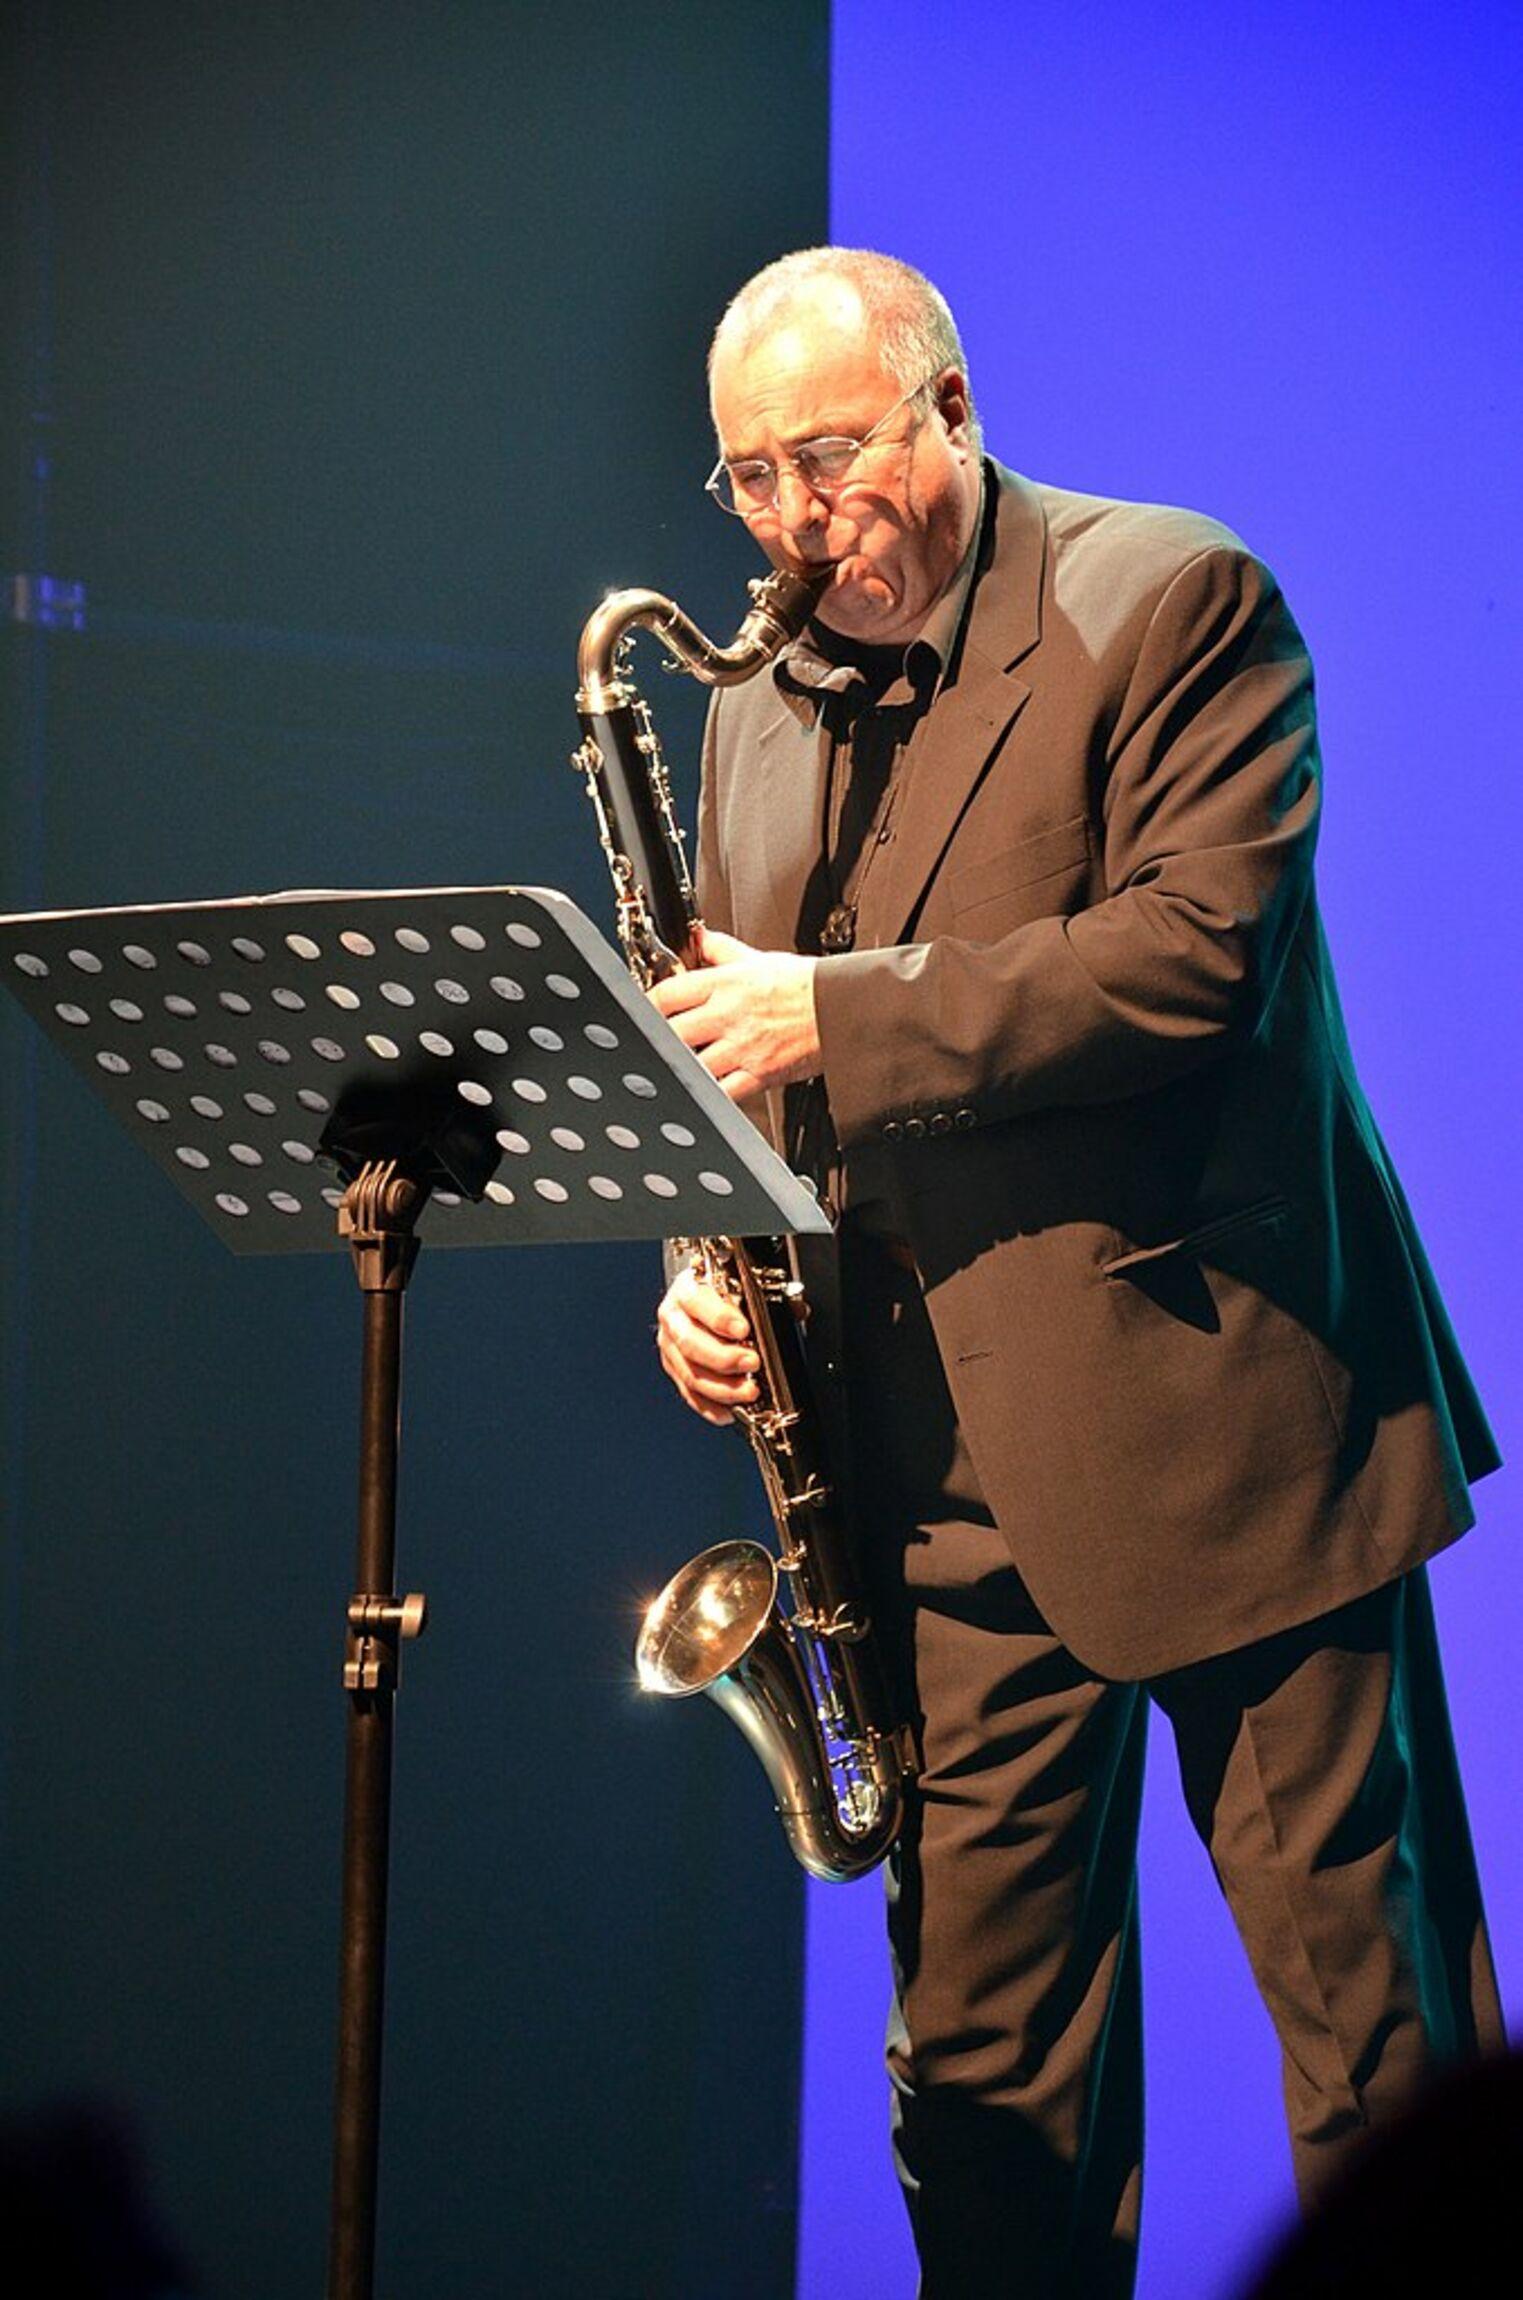 Lothar Krist